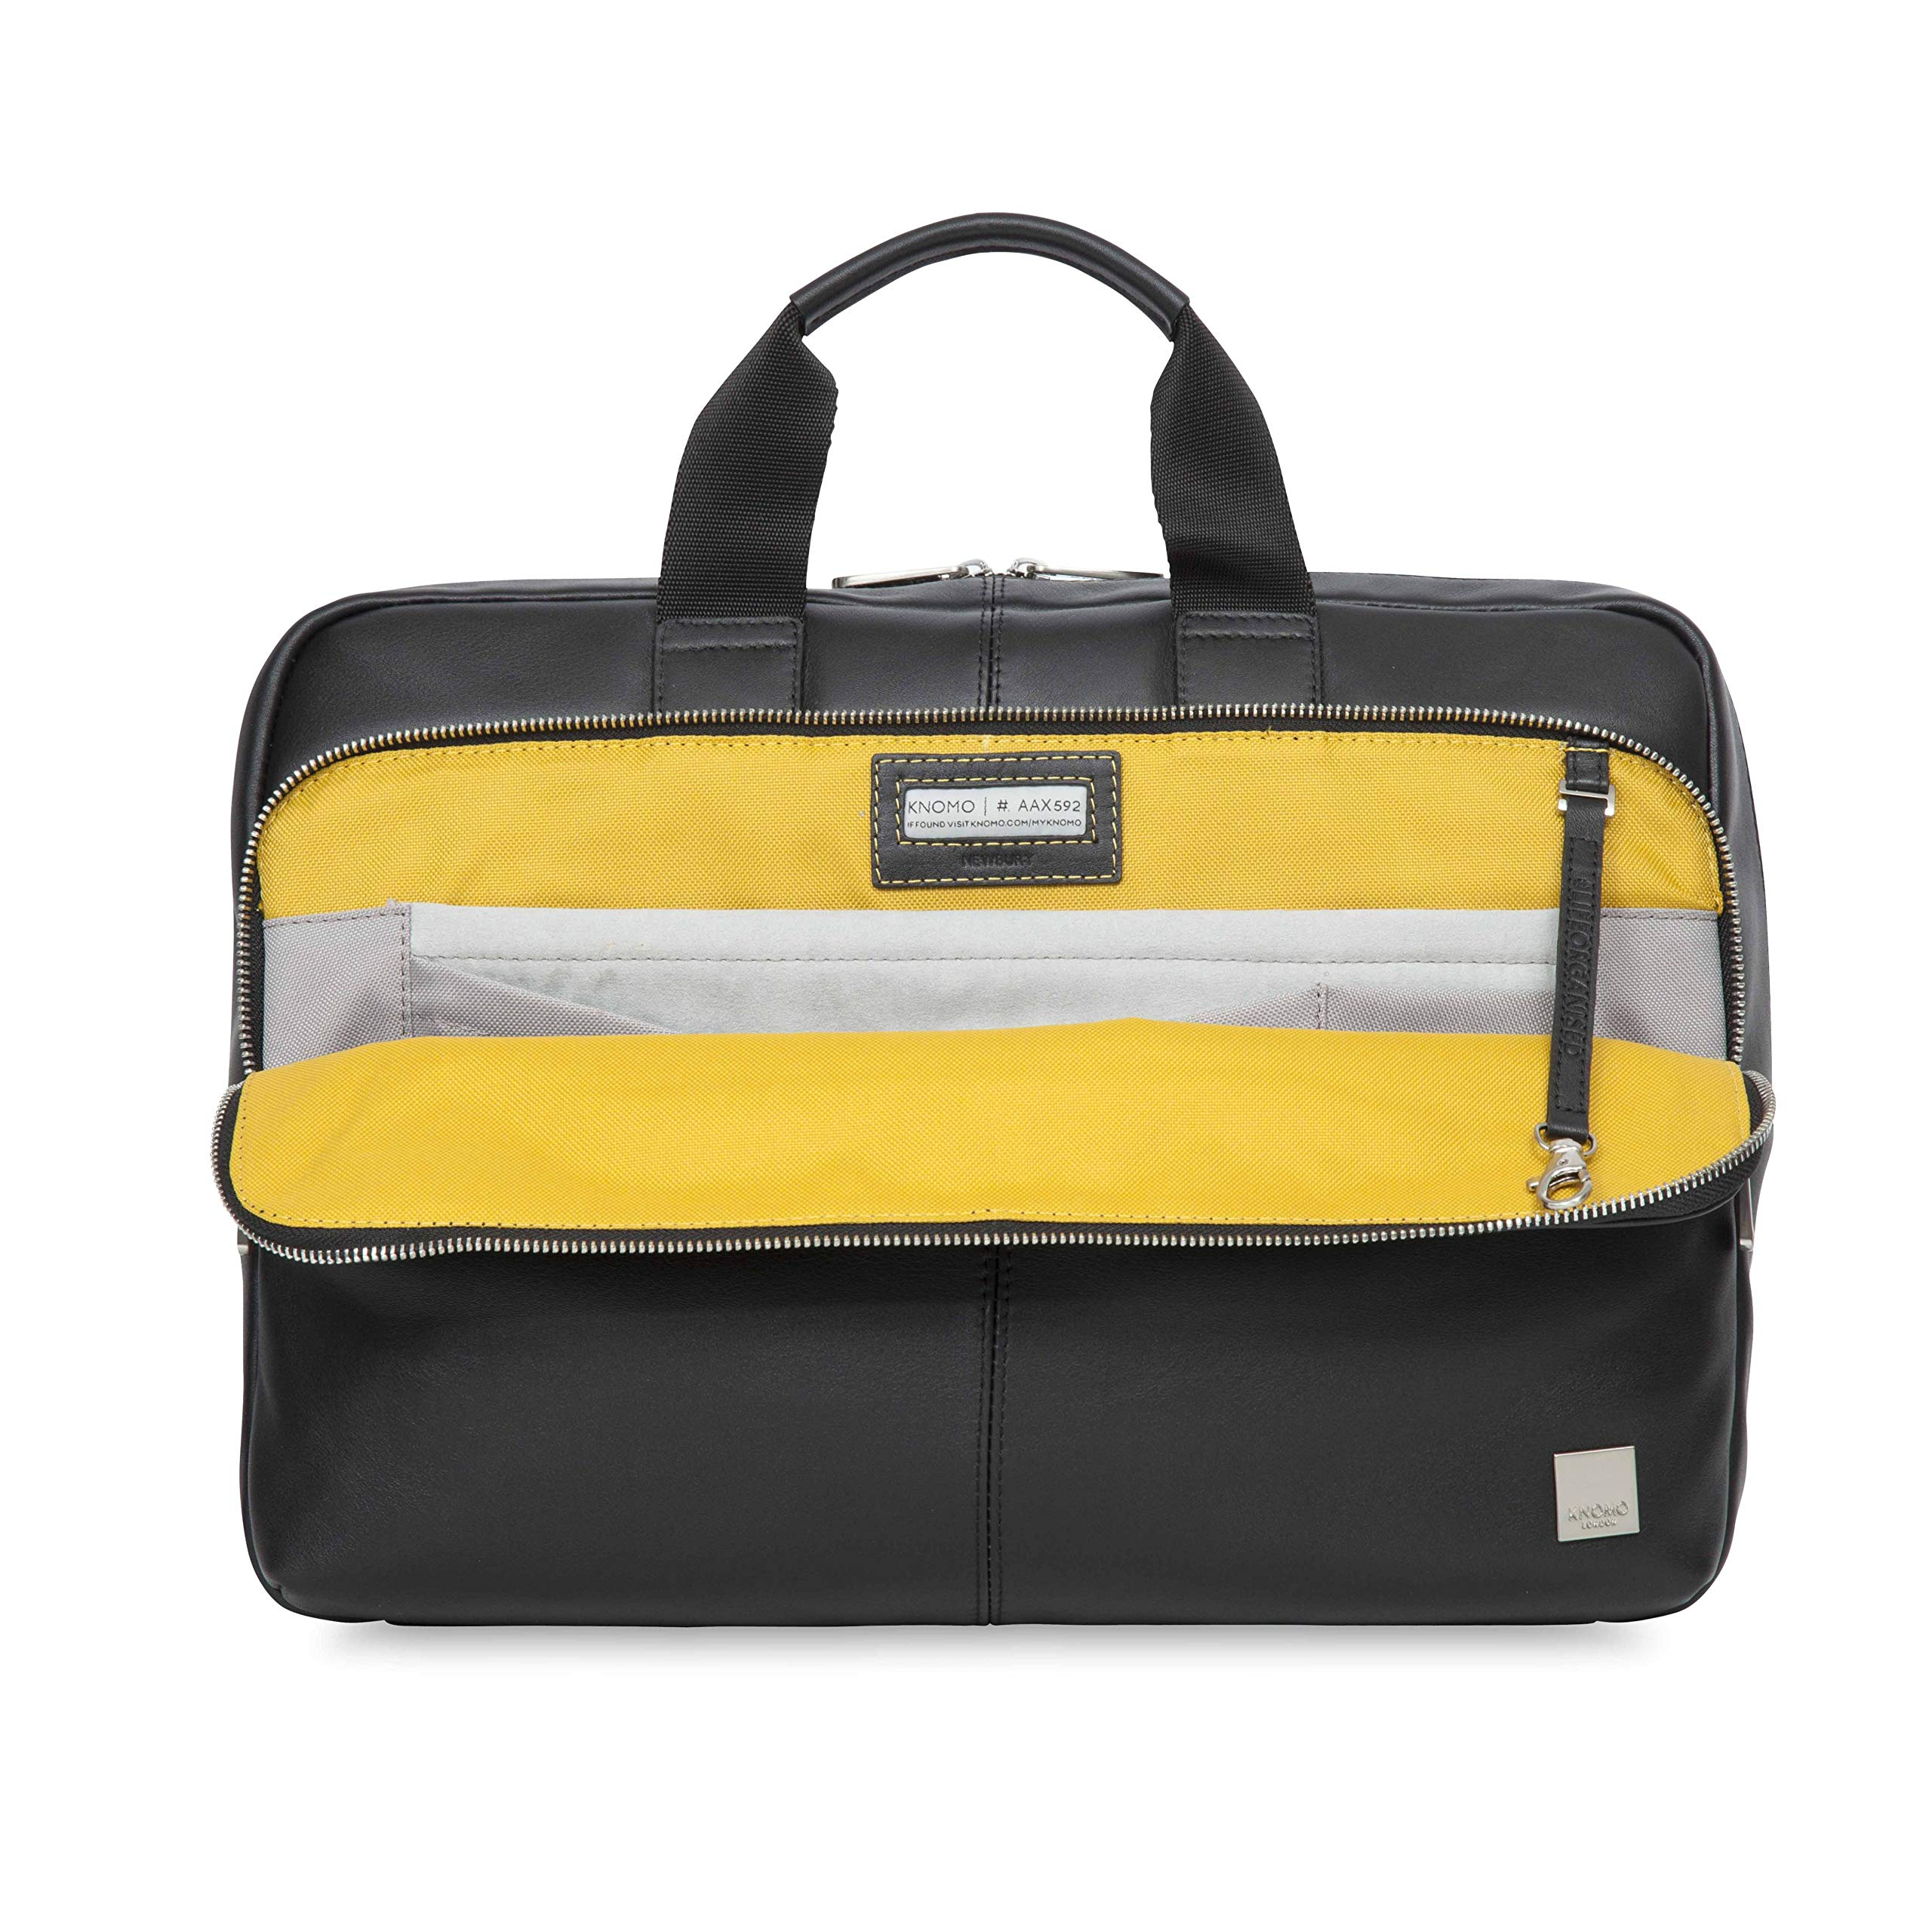 Knomo Luggage Men's Knomo Brompton Classic Newbury Full Leather Single Zip Brief 15''-Black Briefcase One Size